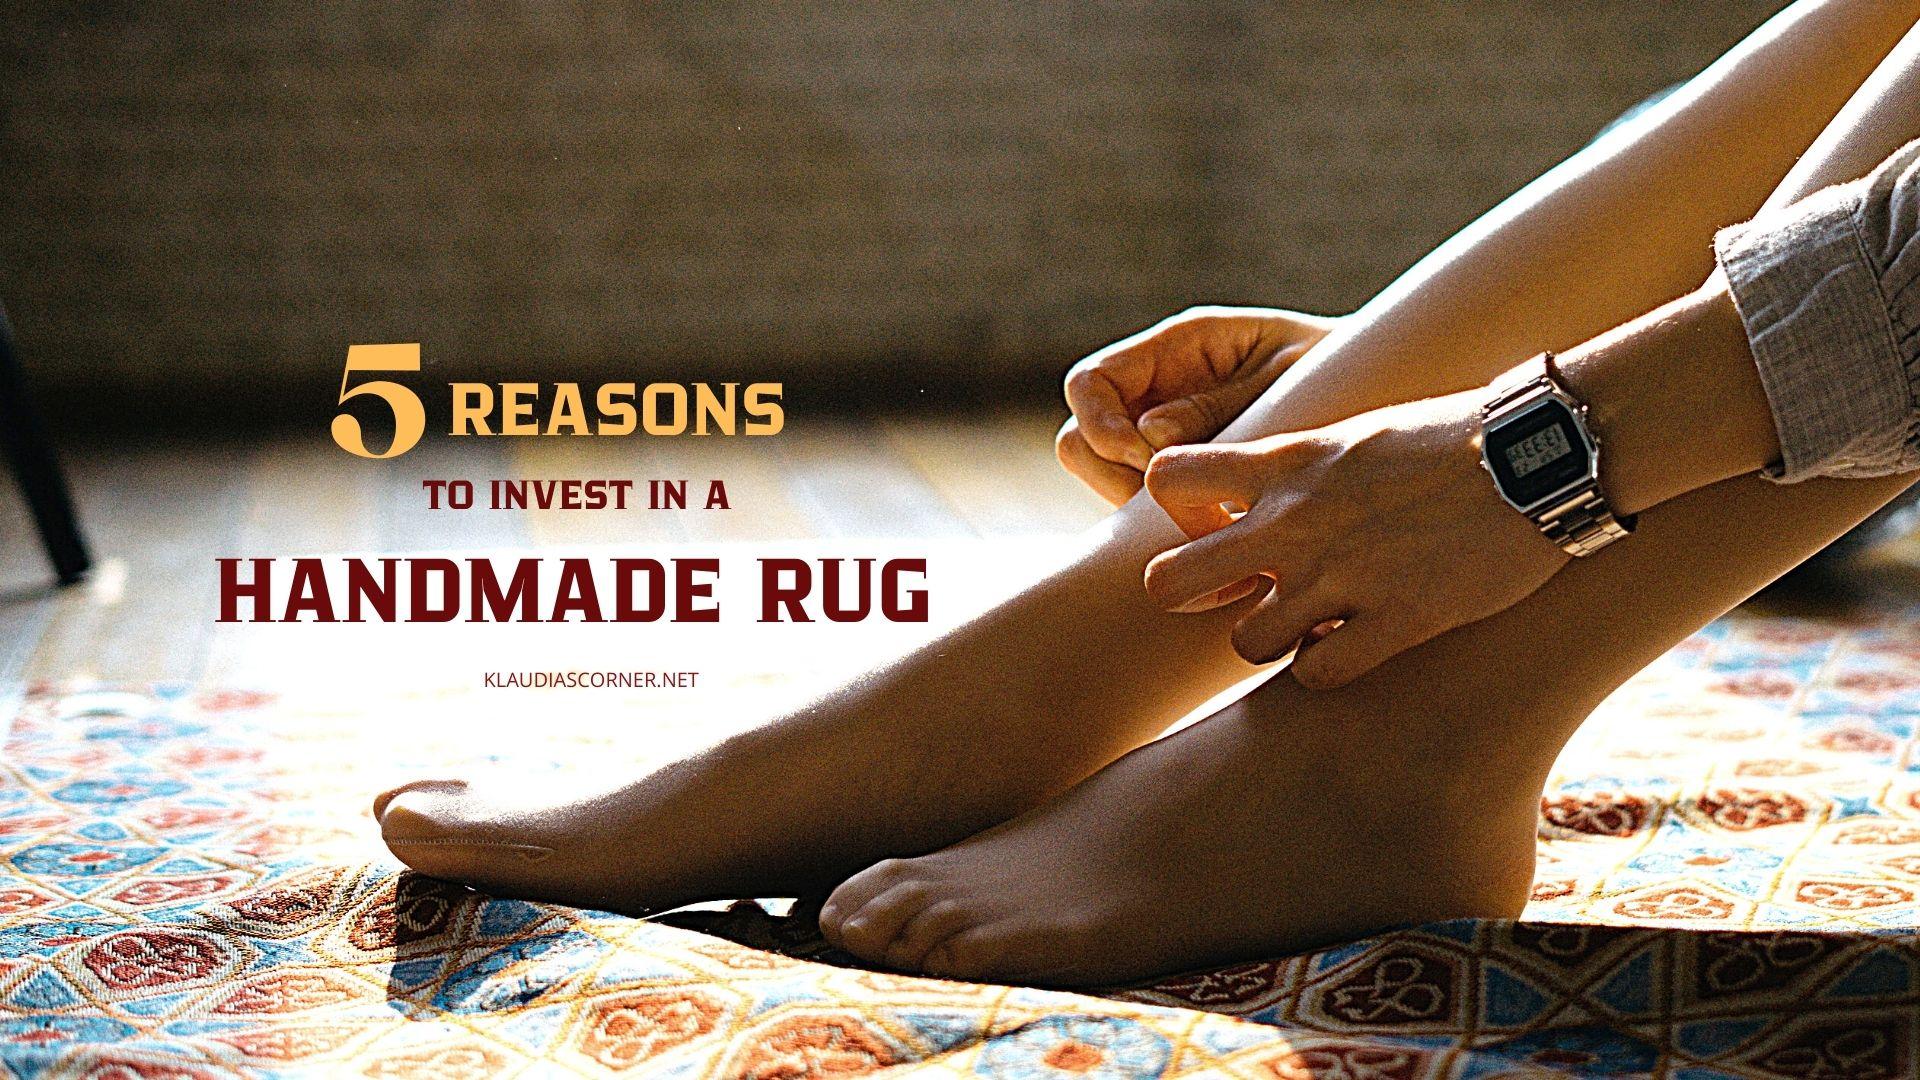 5 Reasons to Invest in a Handmade Rug - klaudiascorner.net